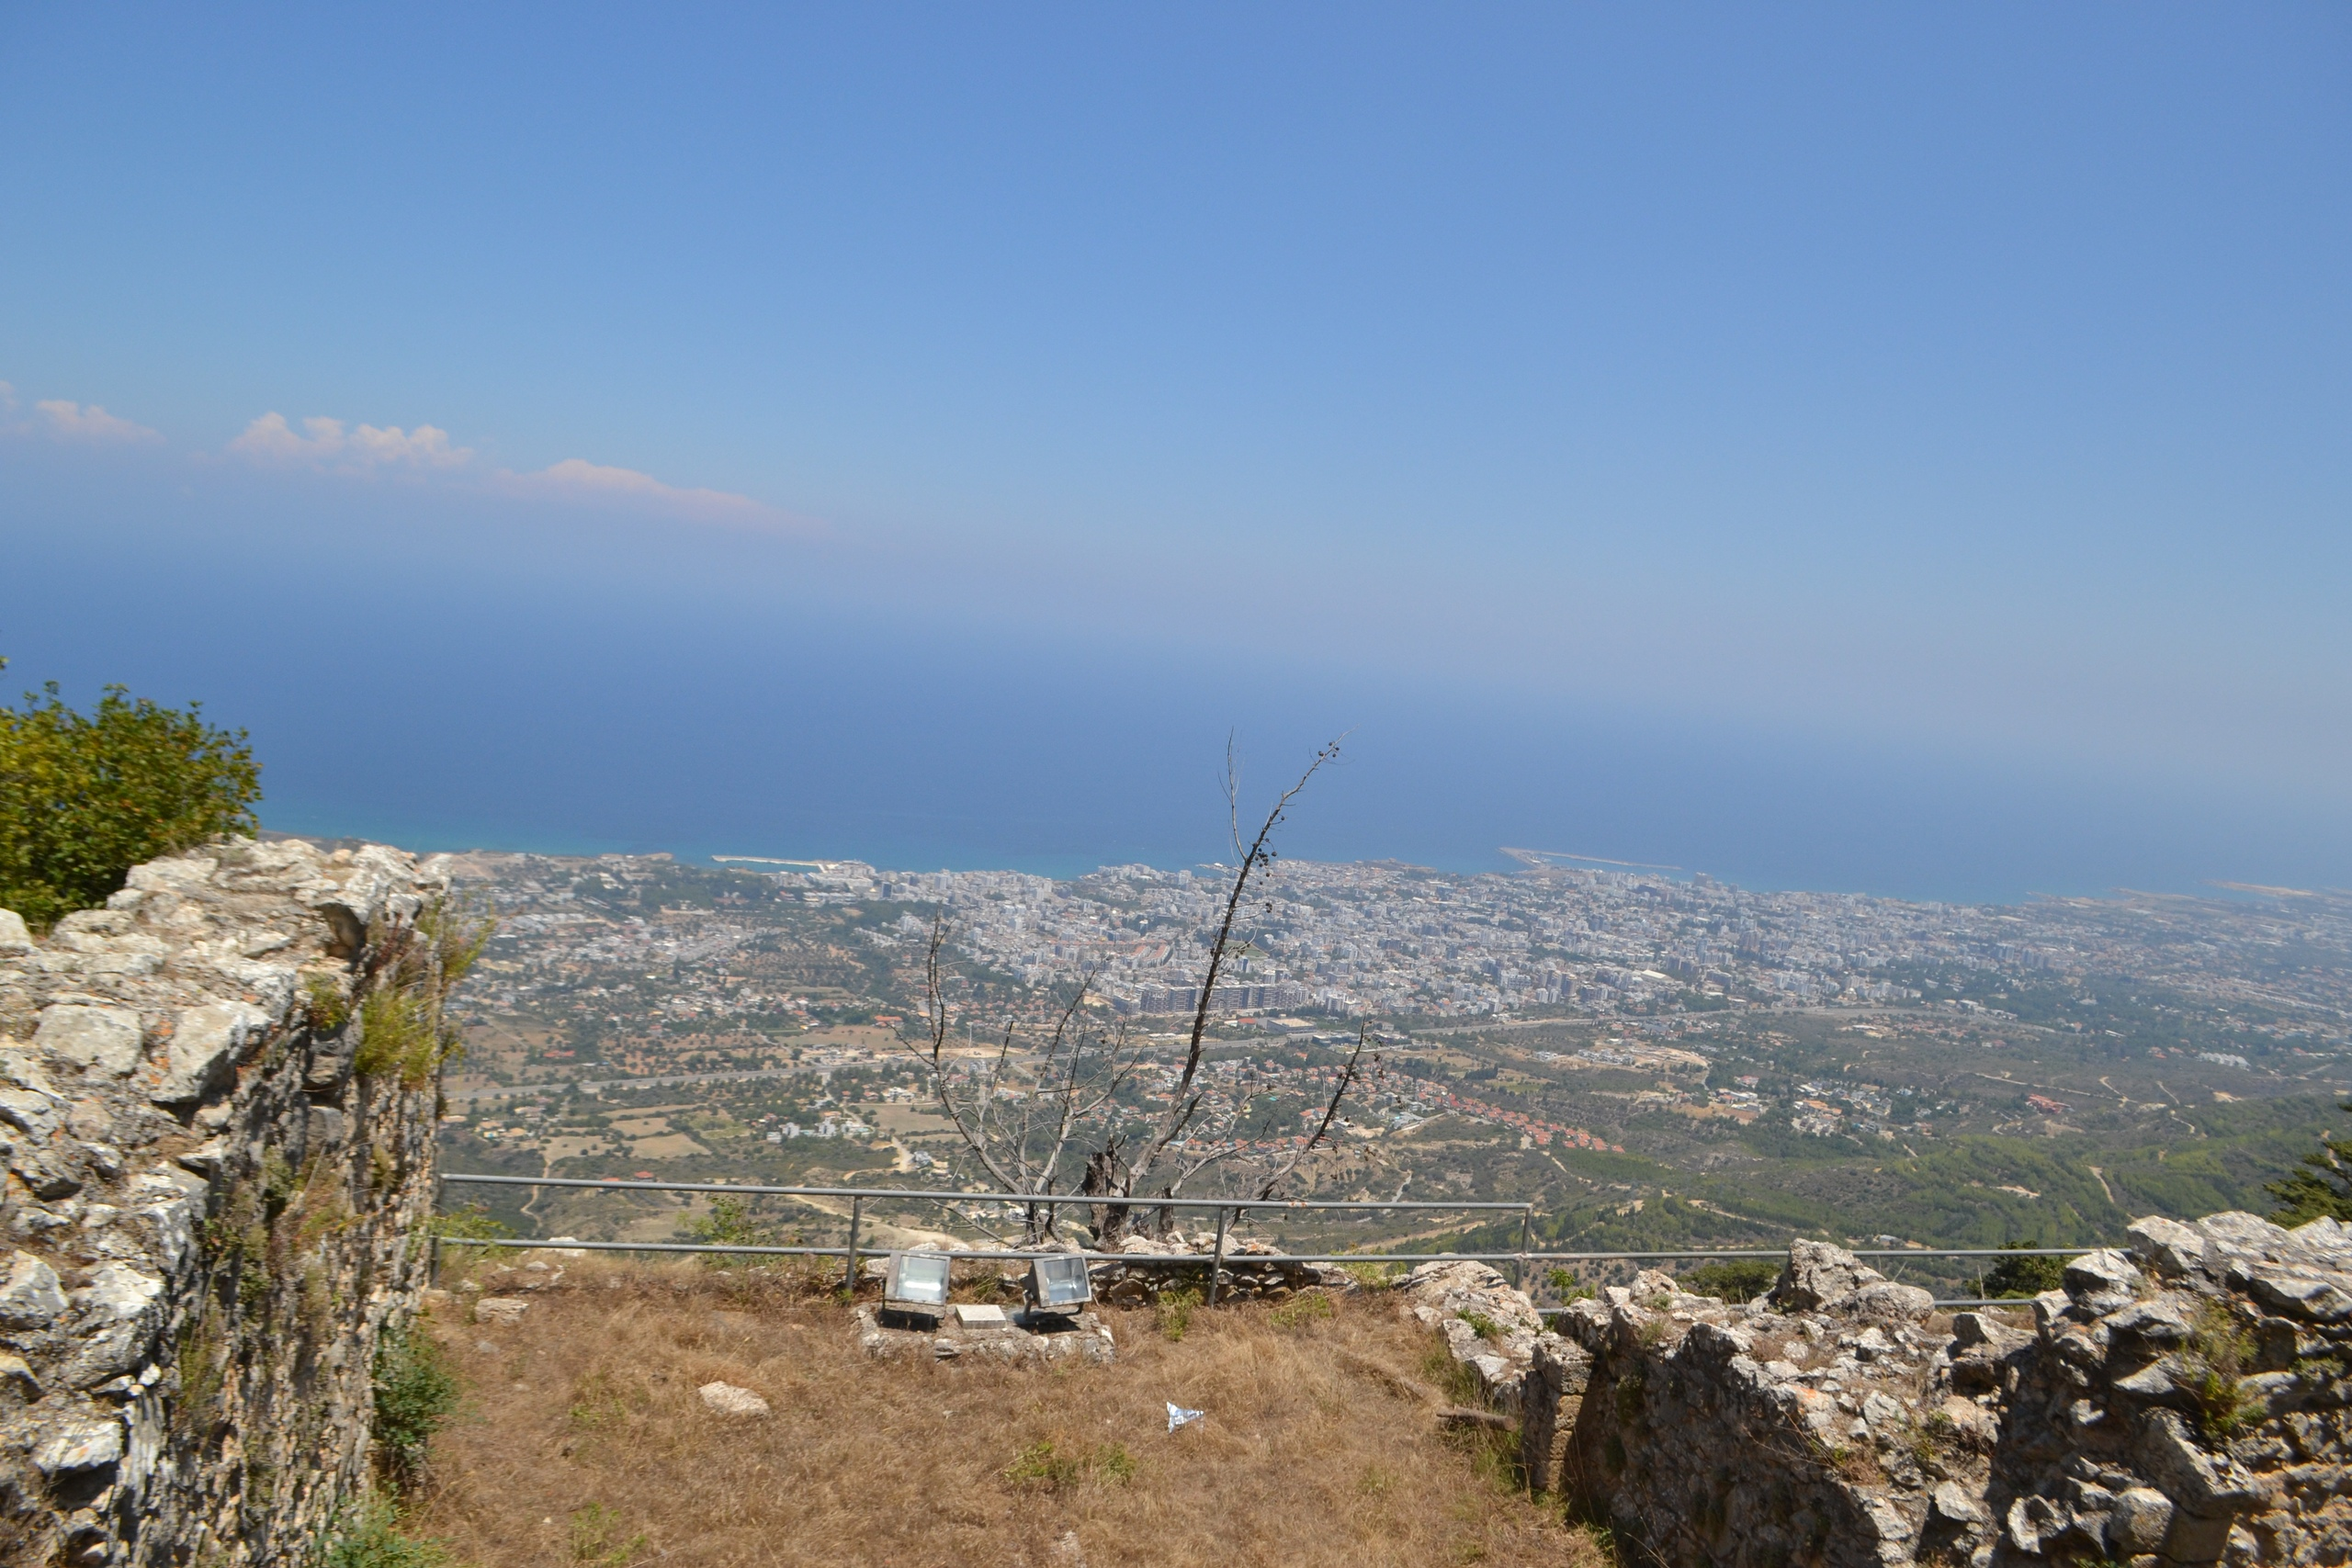 Северный Кипр. Замок Святого Иллариона. (фото). - Страница 2 AZhi5cGUBUA